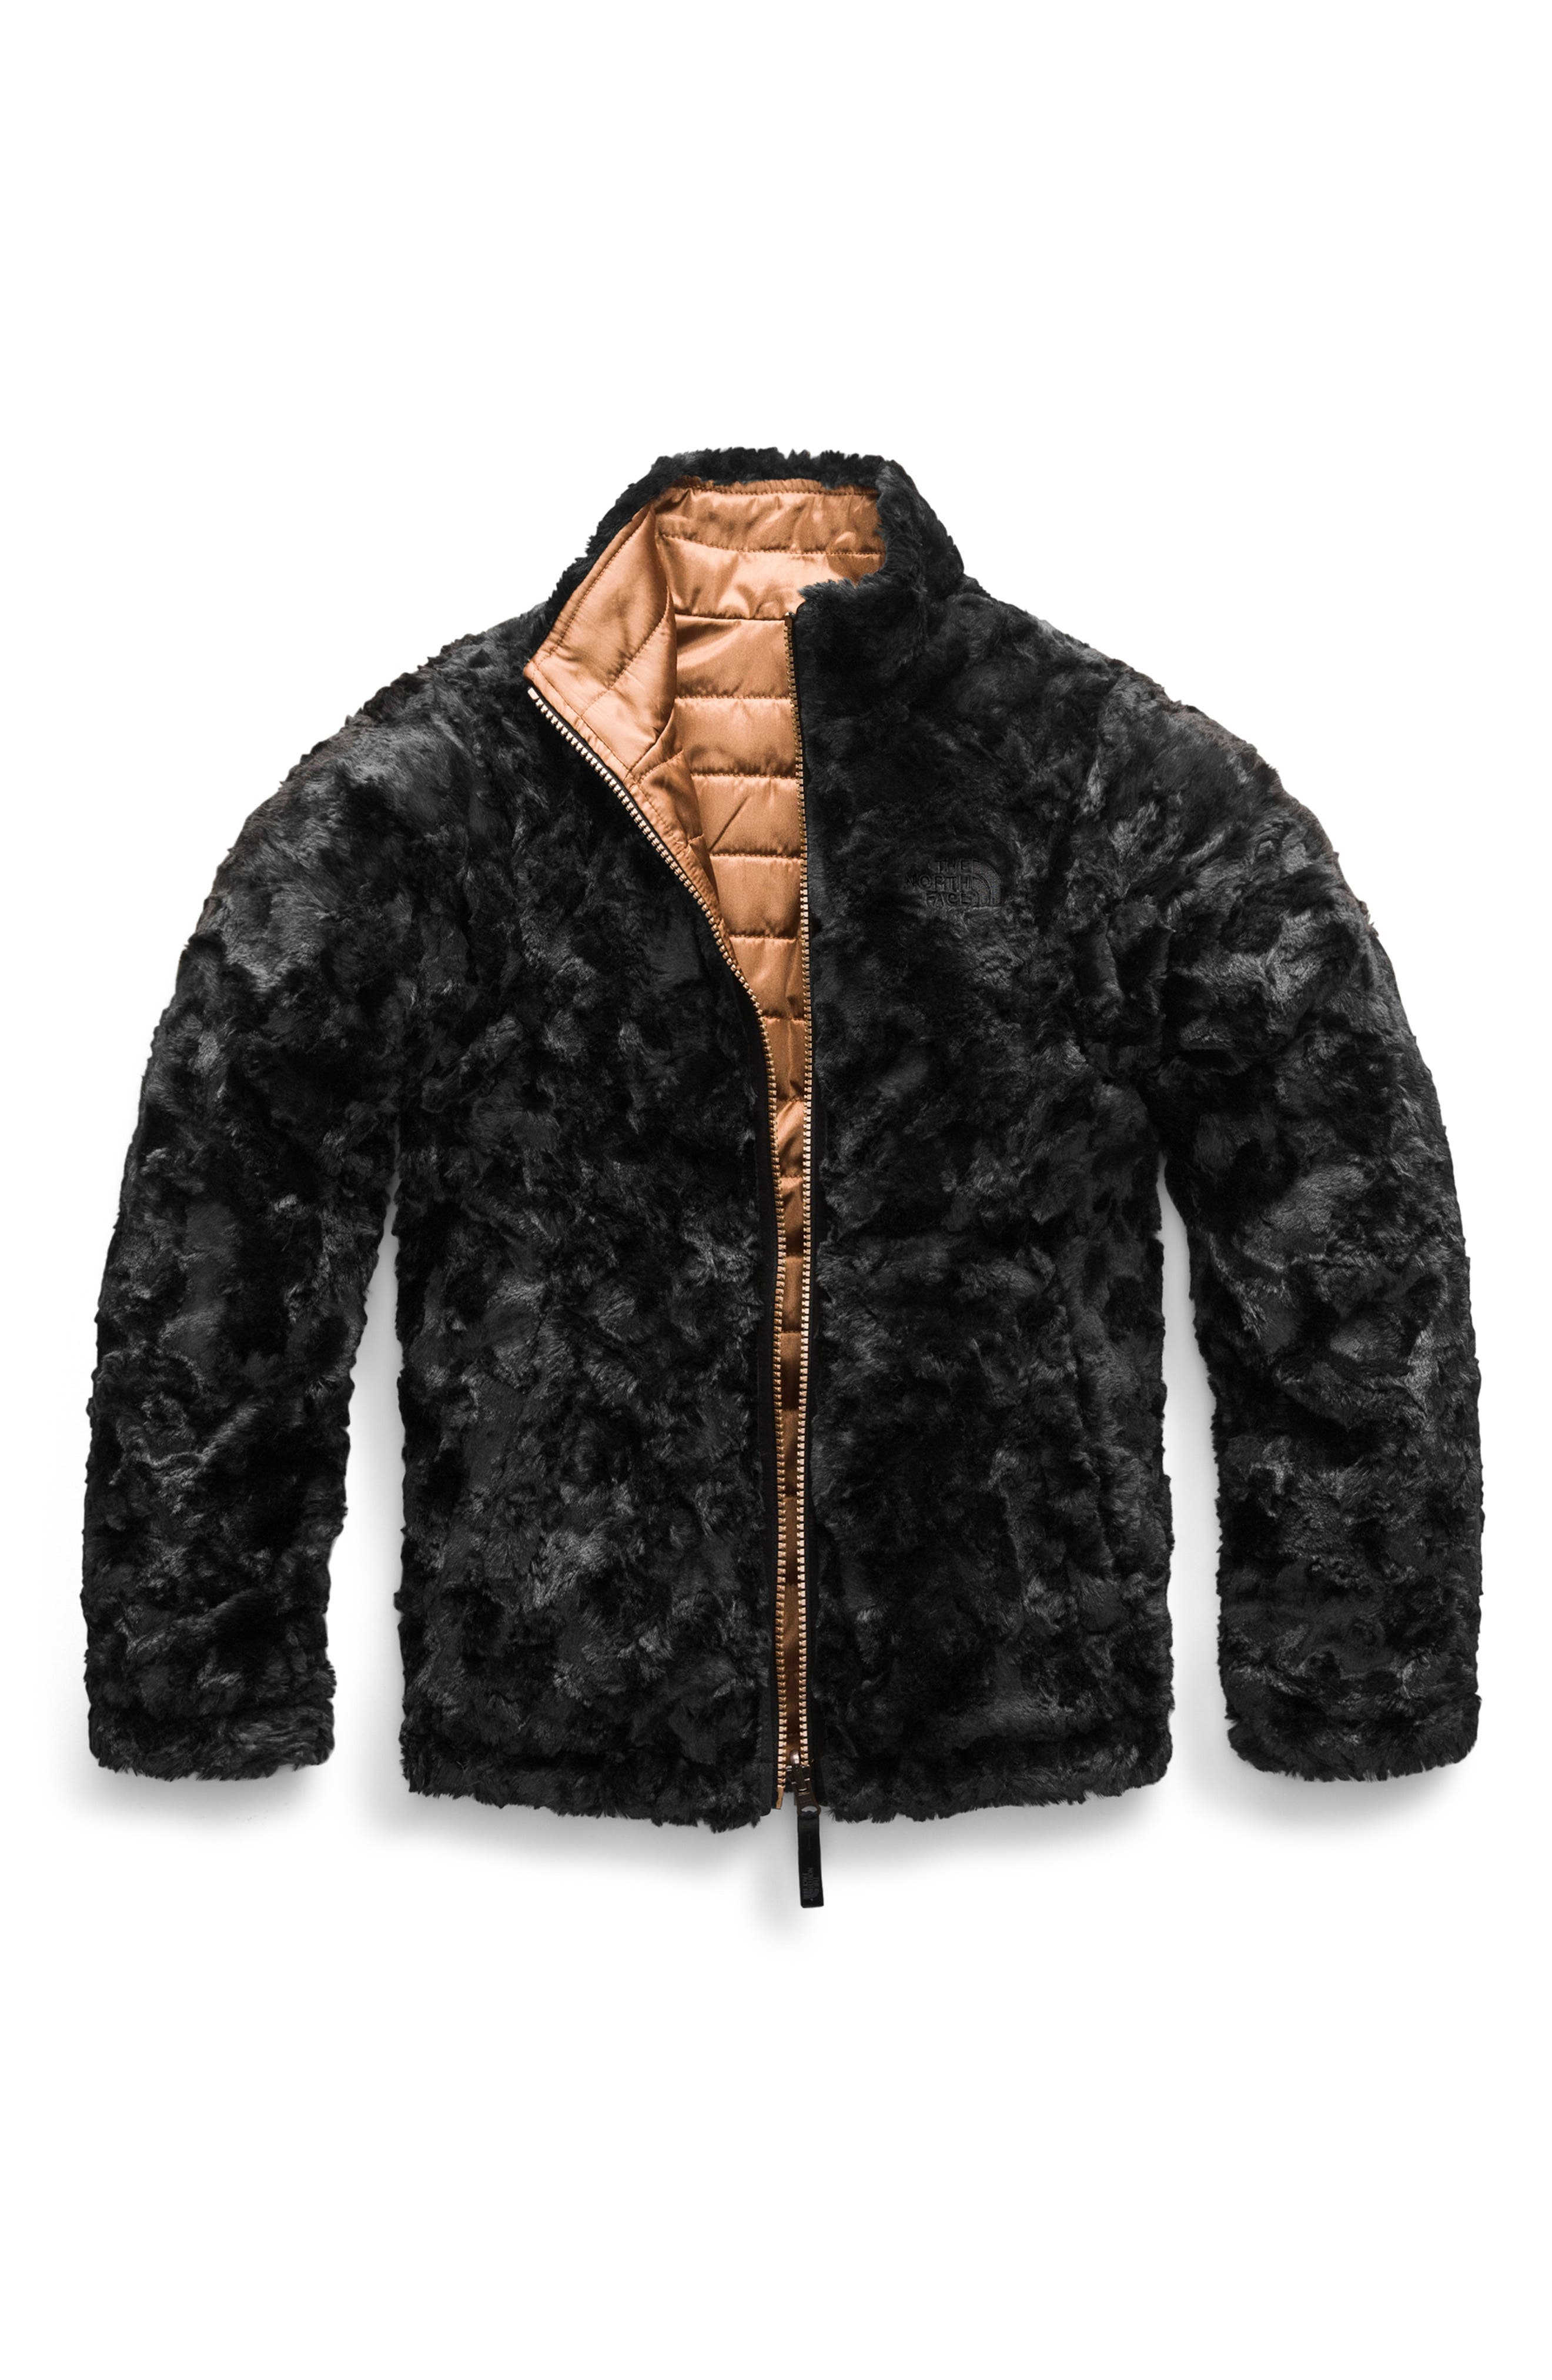 Mossbud Swirl Reversible Water Resistant Jacket,                             Alternate thumbnail 2, color,                             METALLIC COPPER